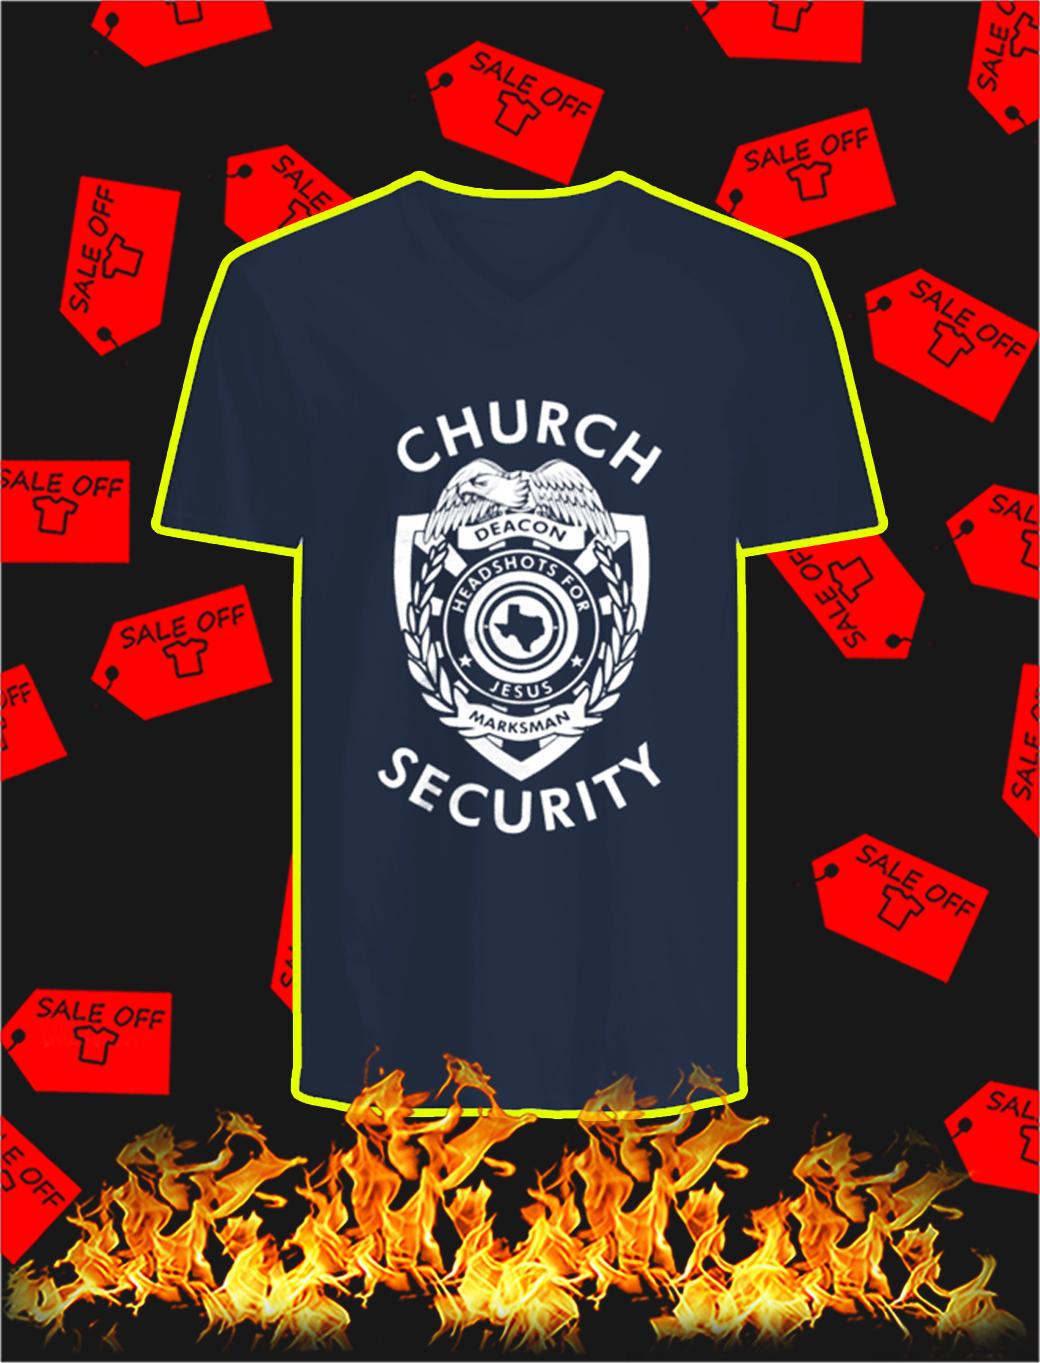 Church Security v-neck